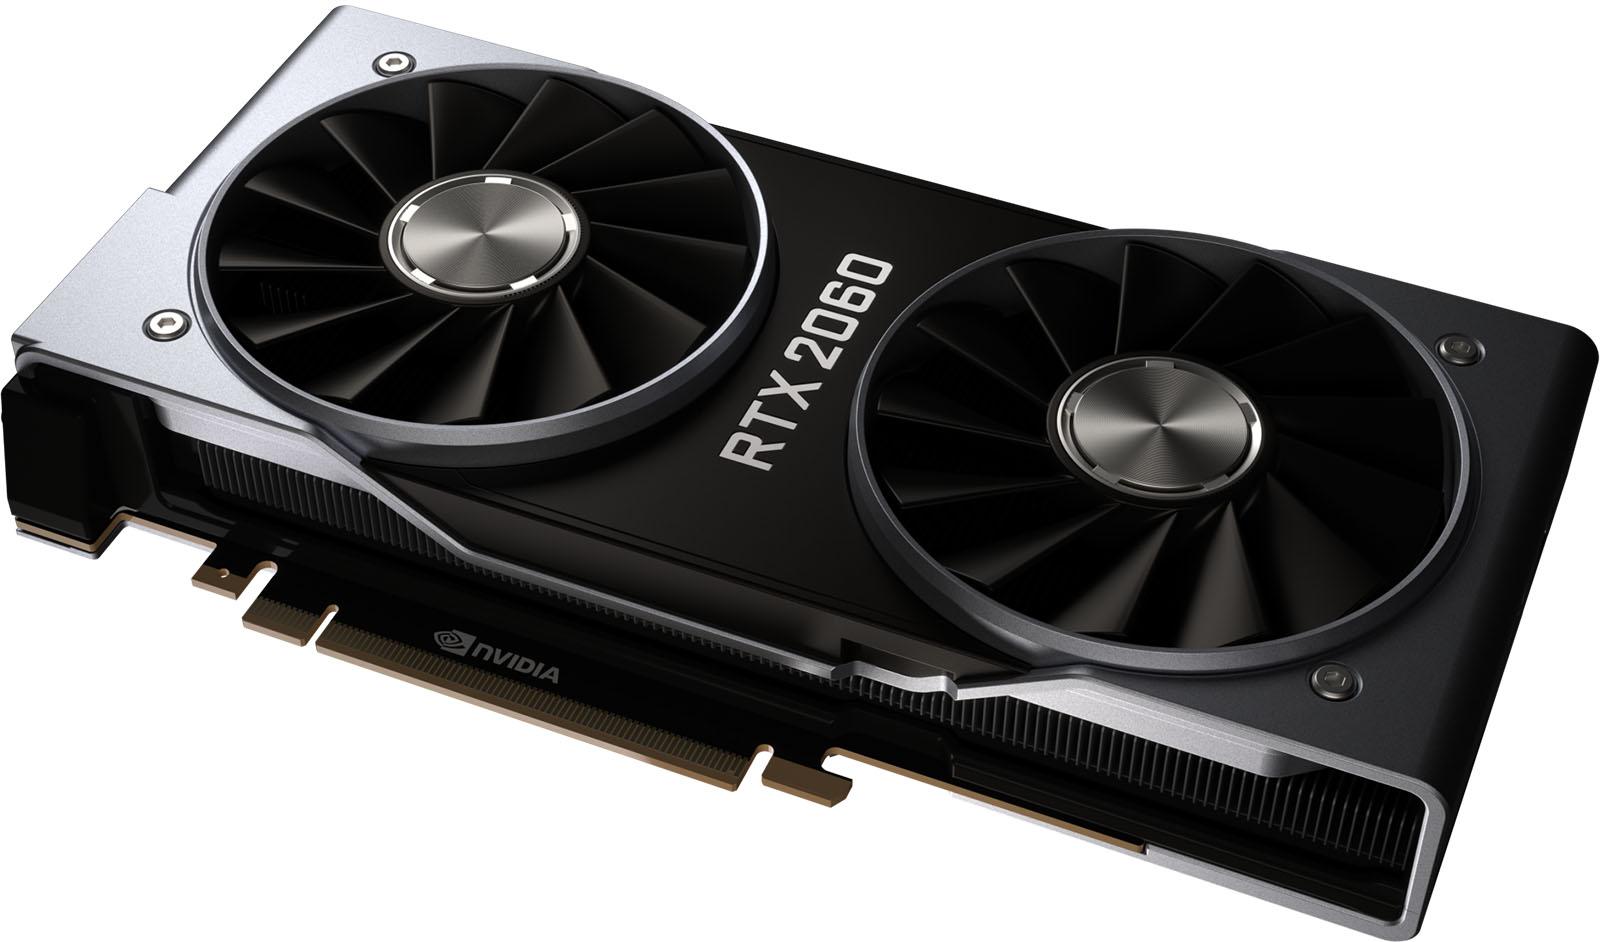 NVIDIA GeForce RTX 2060 1080p & 1440p Gaming Performance – Techgage